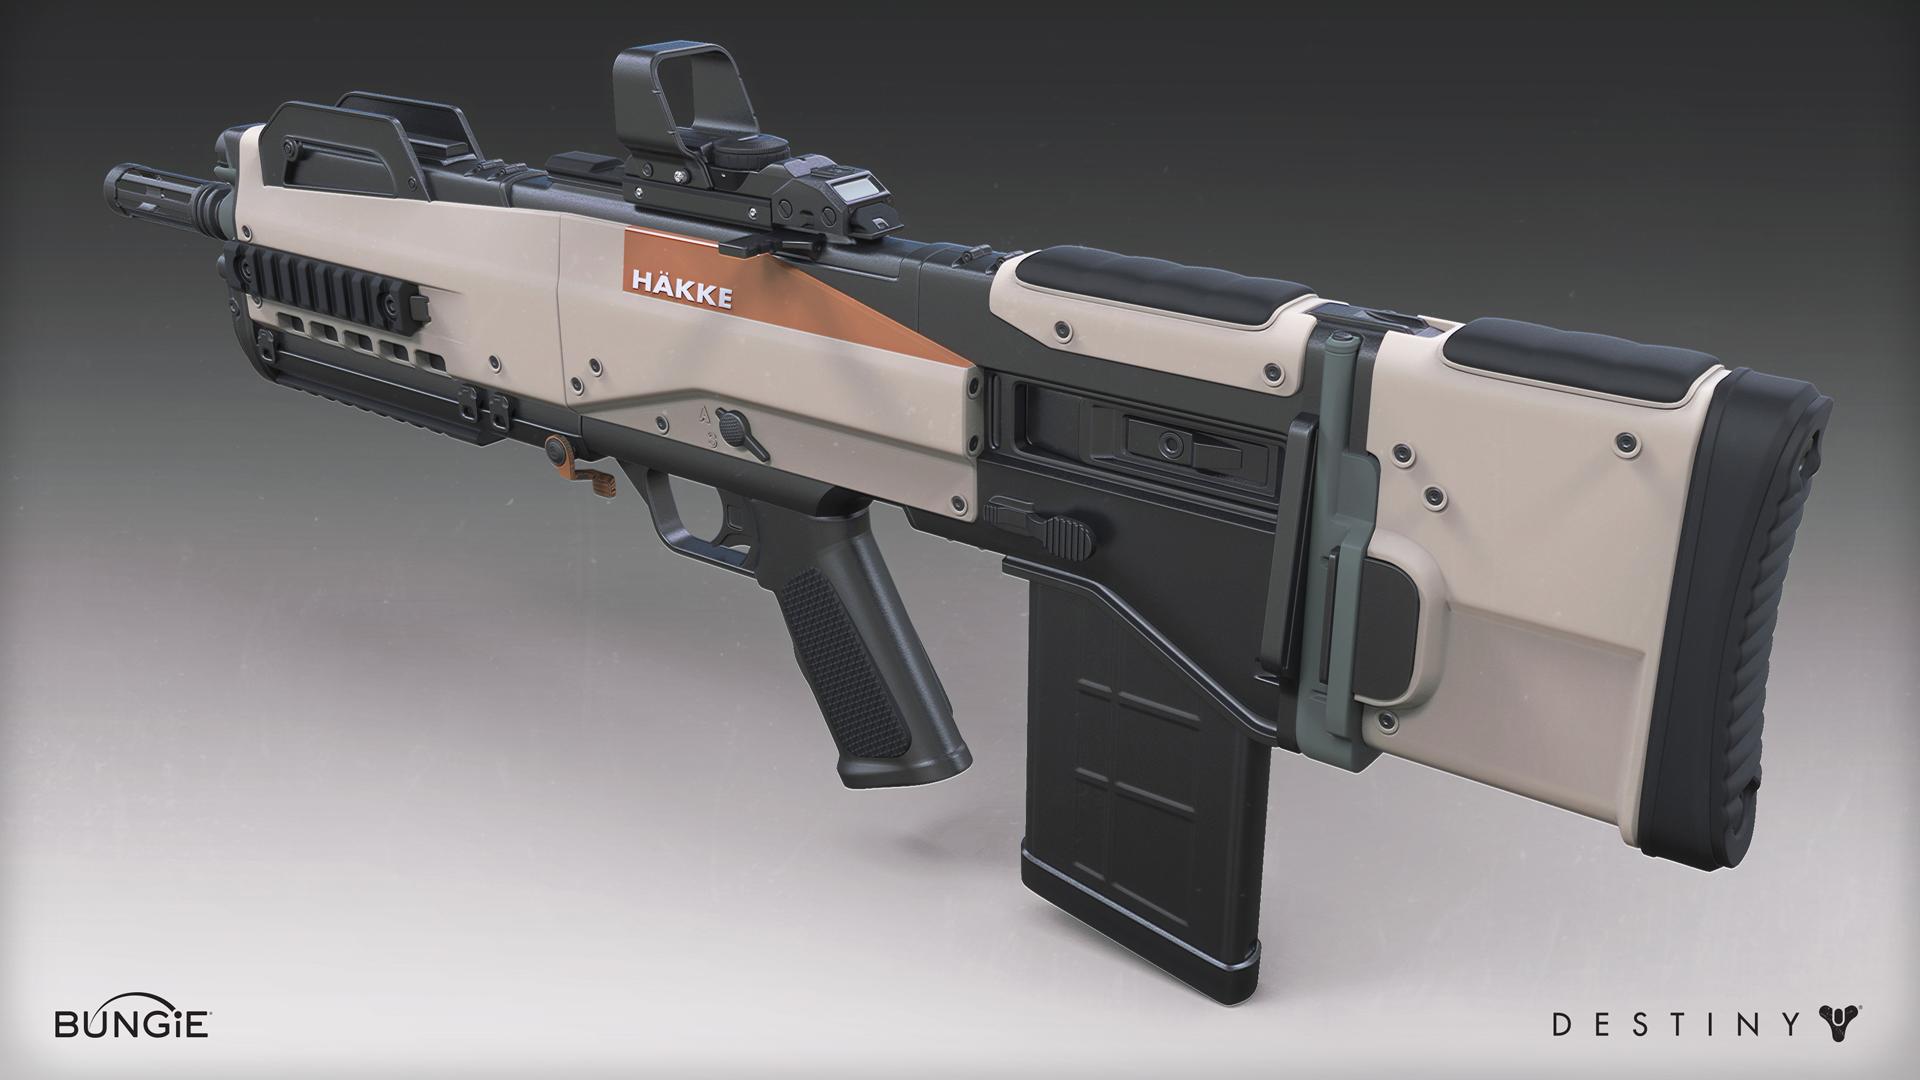 Top 5 Legendary Pulse Rifles + Pro Tips - PlanetDestiny.com